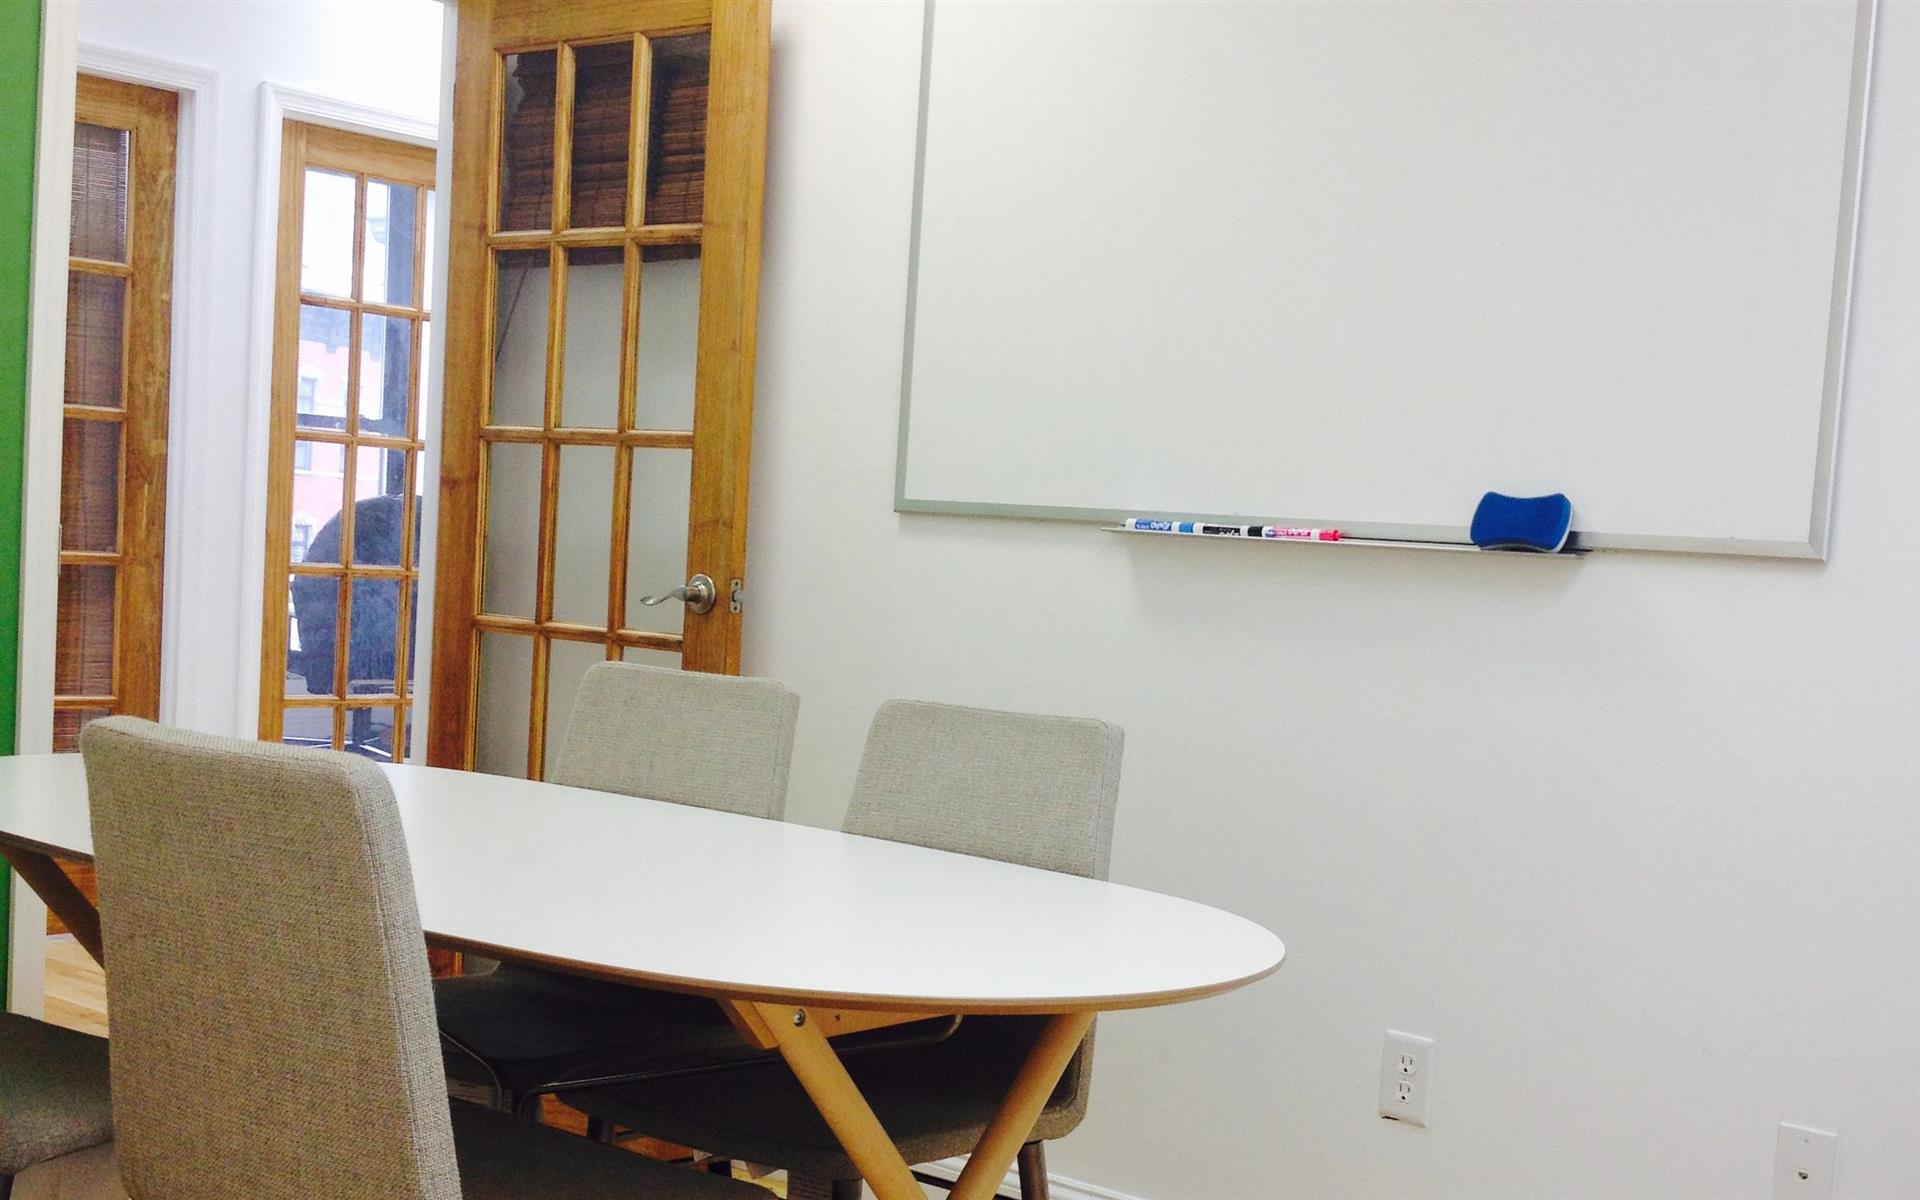 Indiegrove - Meeting Room (4th Floor)